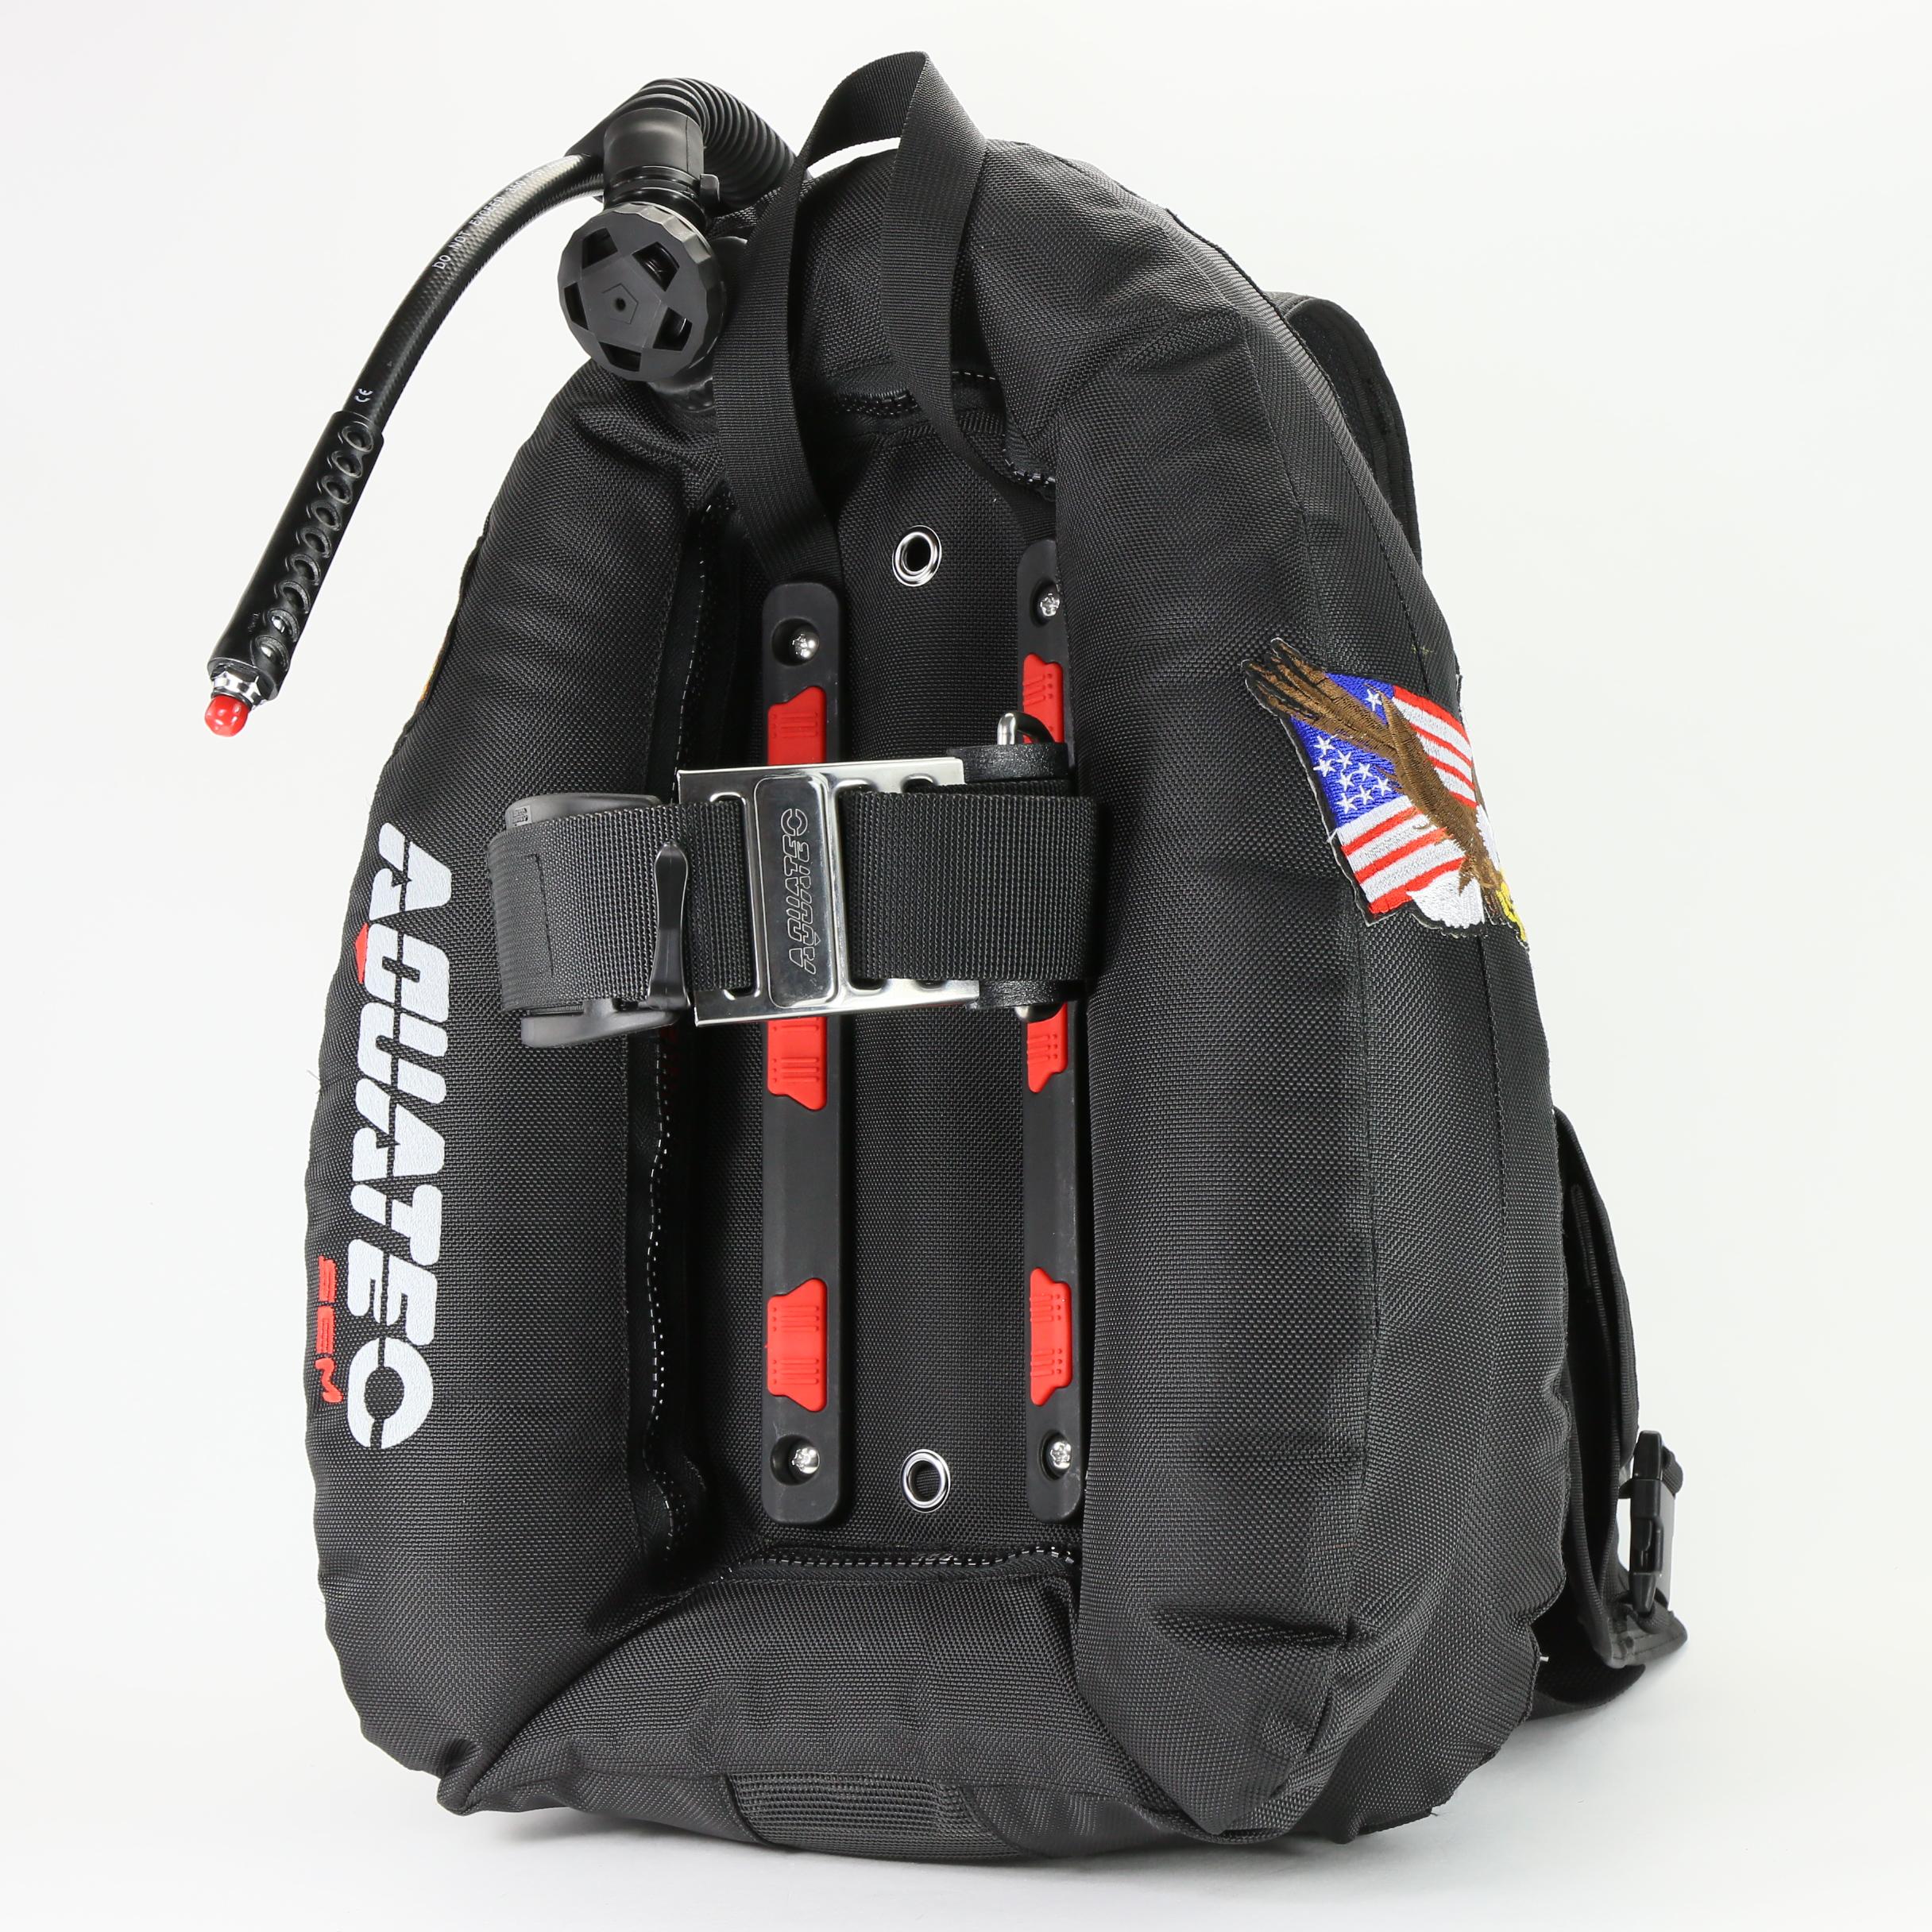 Aquatec comfort harness mono ocean wing package - Пружинные крылья (BK / RD)